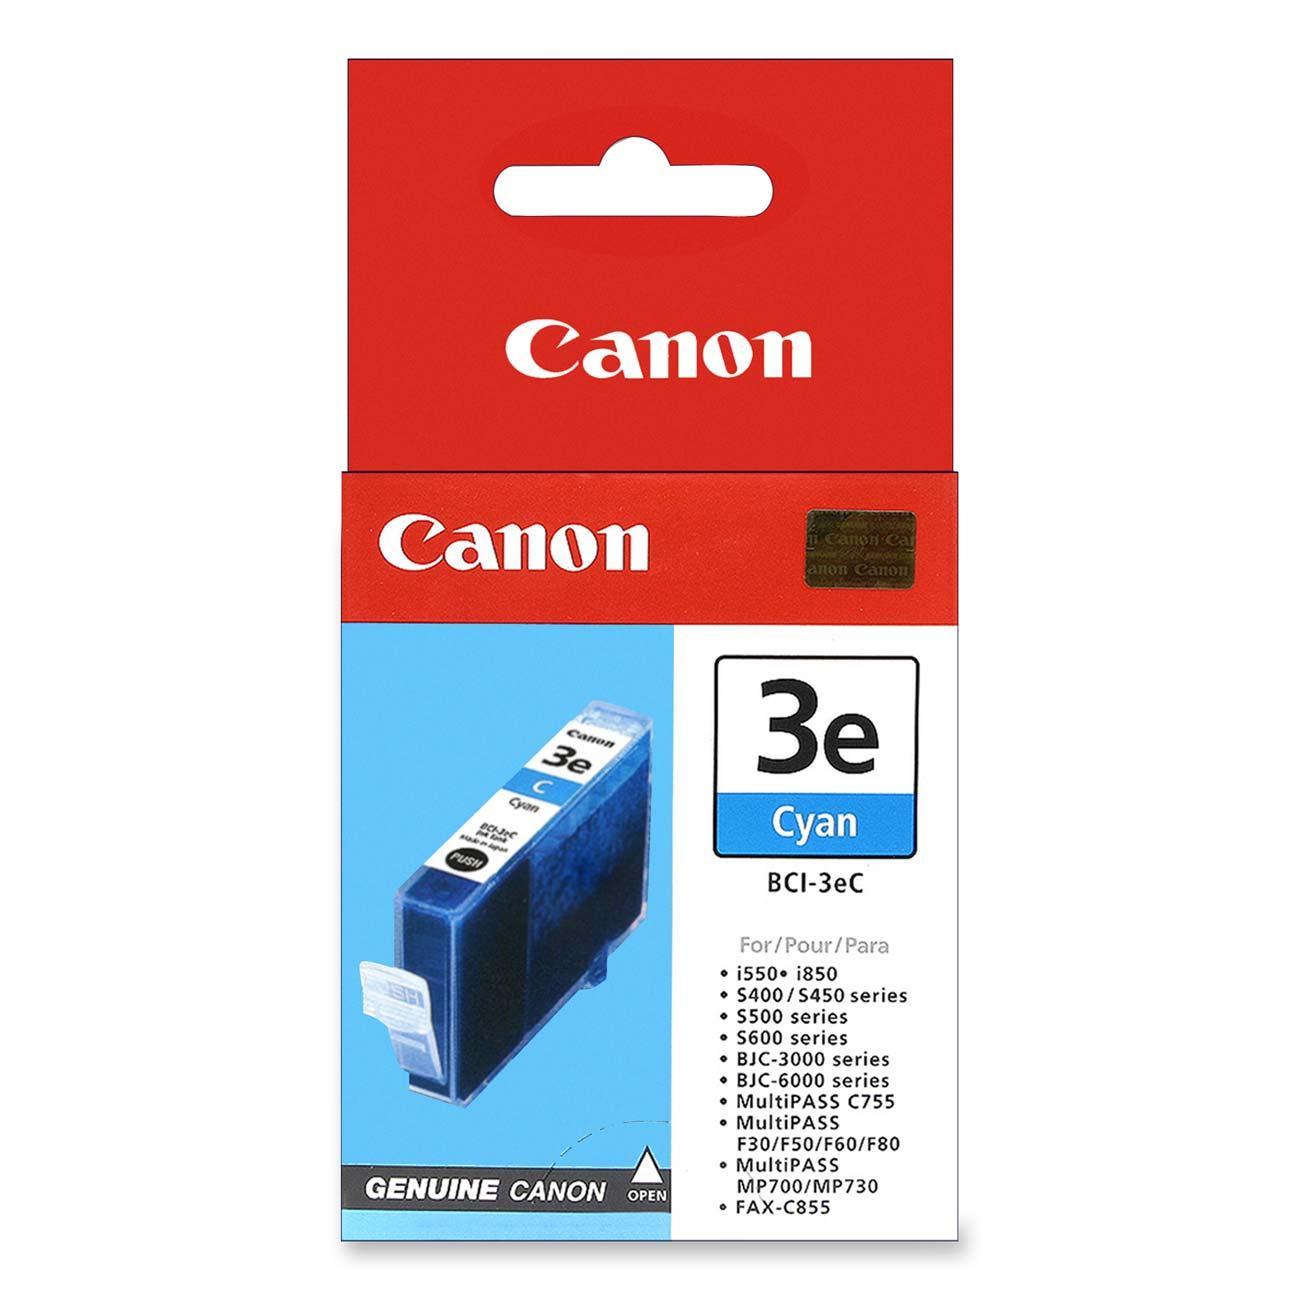 Canon BCI-3EC inktcartridge Original Cyaan 1 stuk(s)